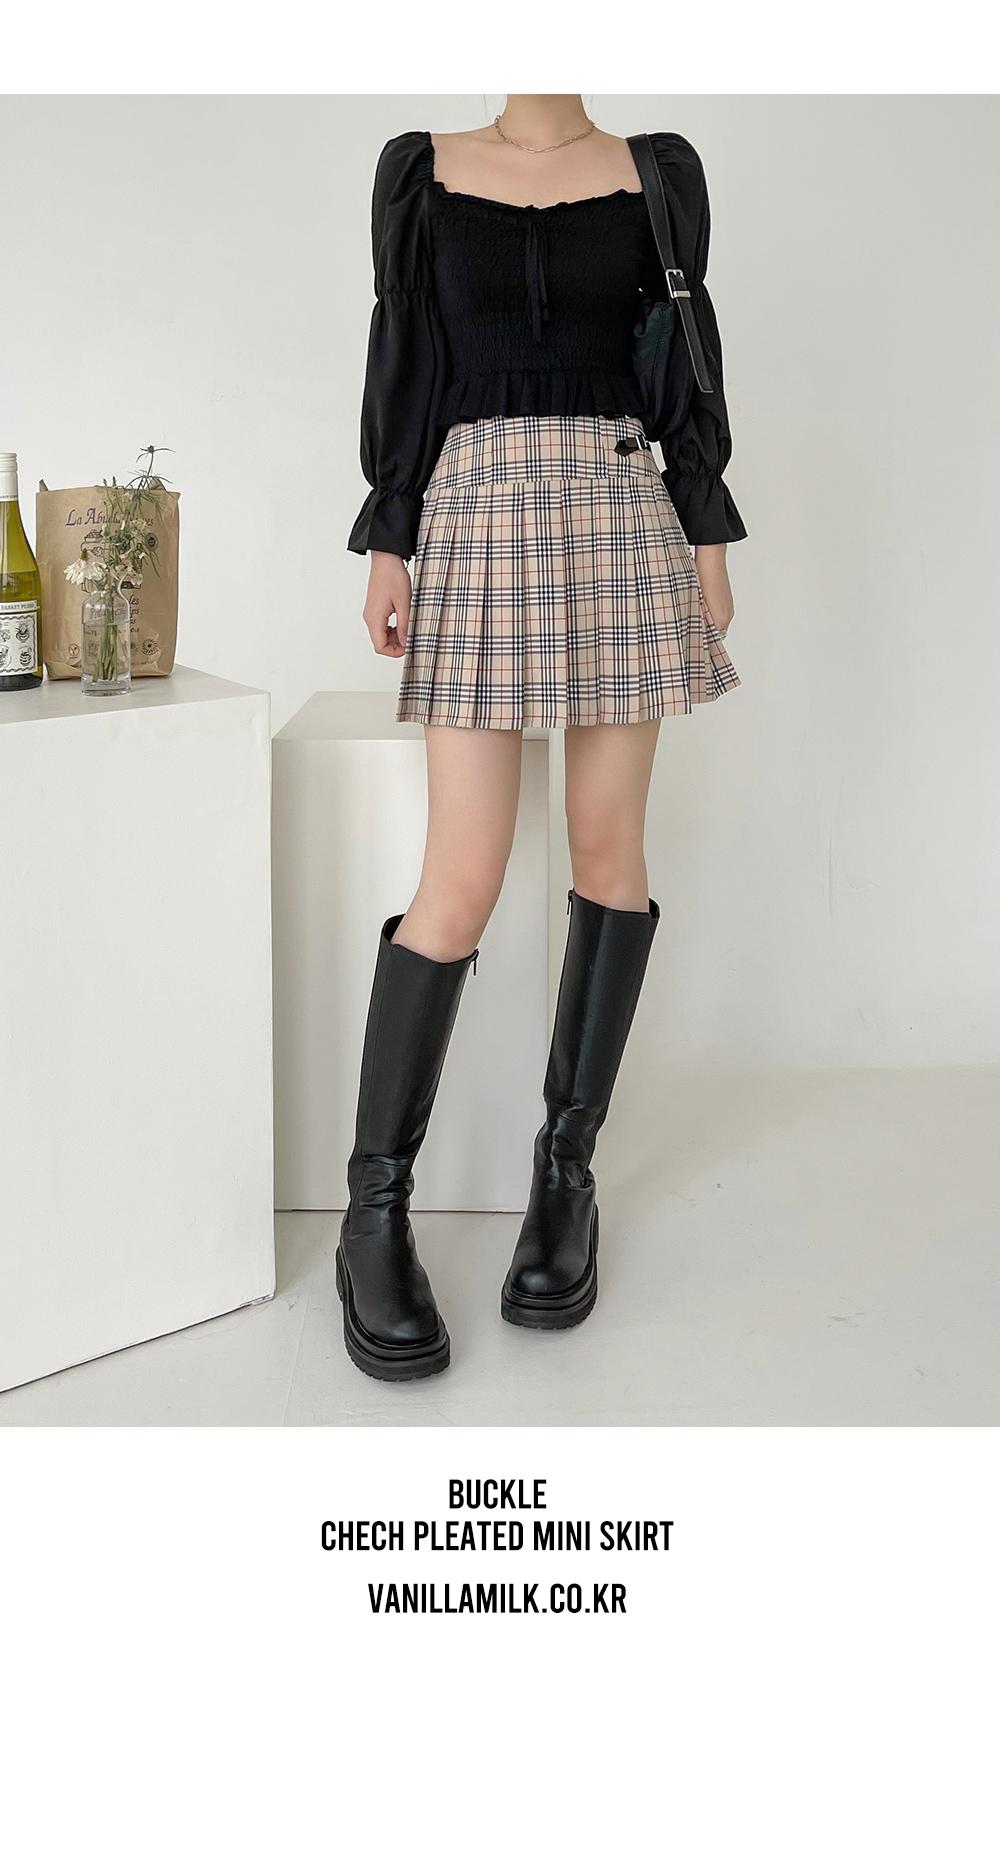 Buckle check pleated mini skirt